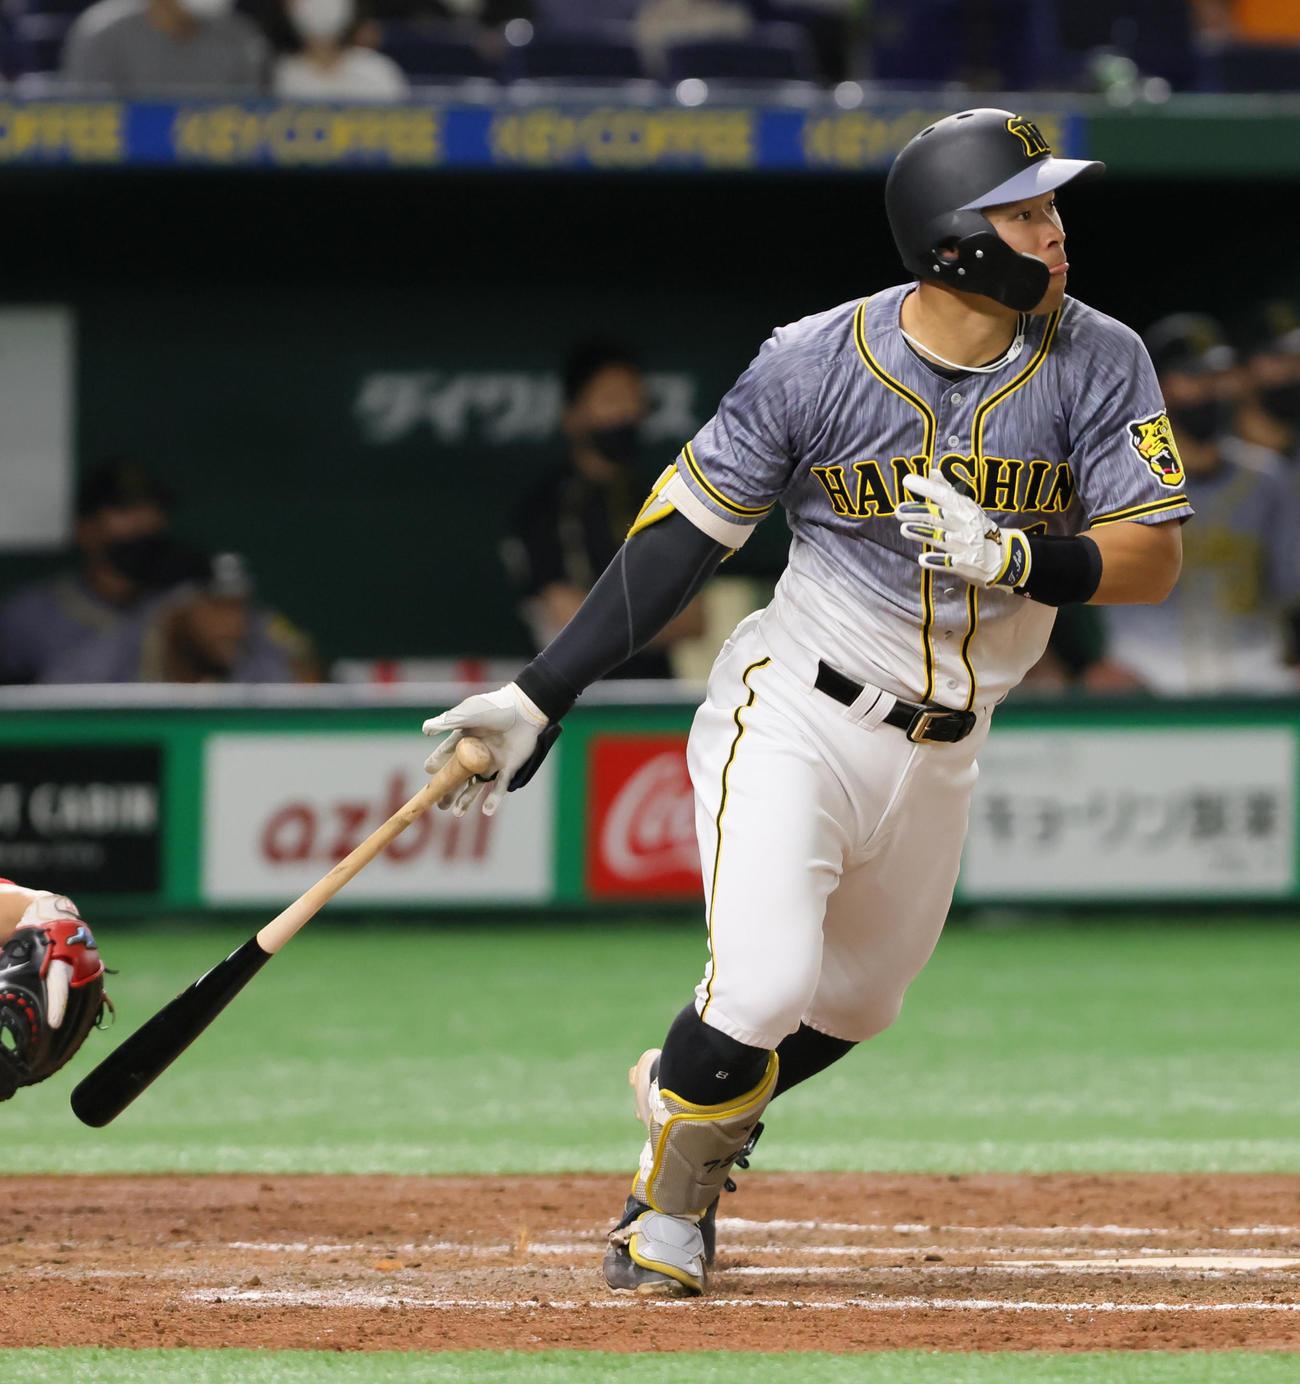 巨人対阪神 3回表阪神1死一、二塁、佐藤輝は中越え2点適時二塁打を放つ(撮影・足立雅史)